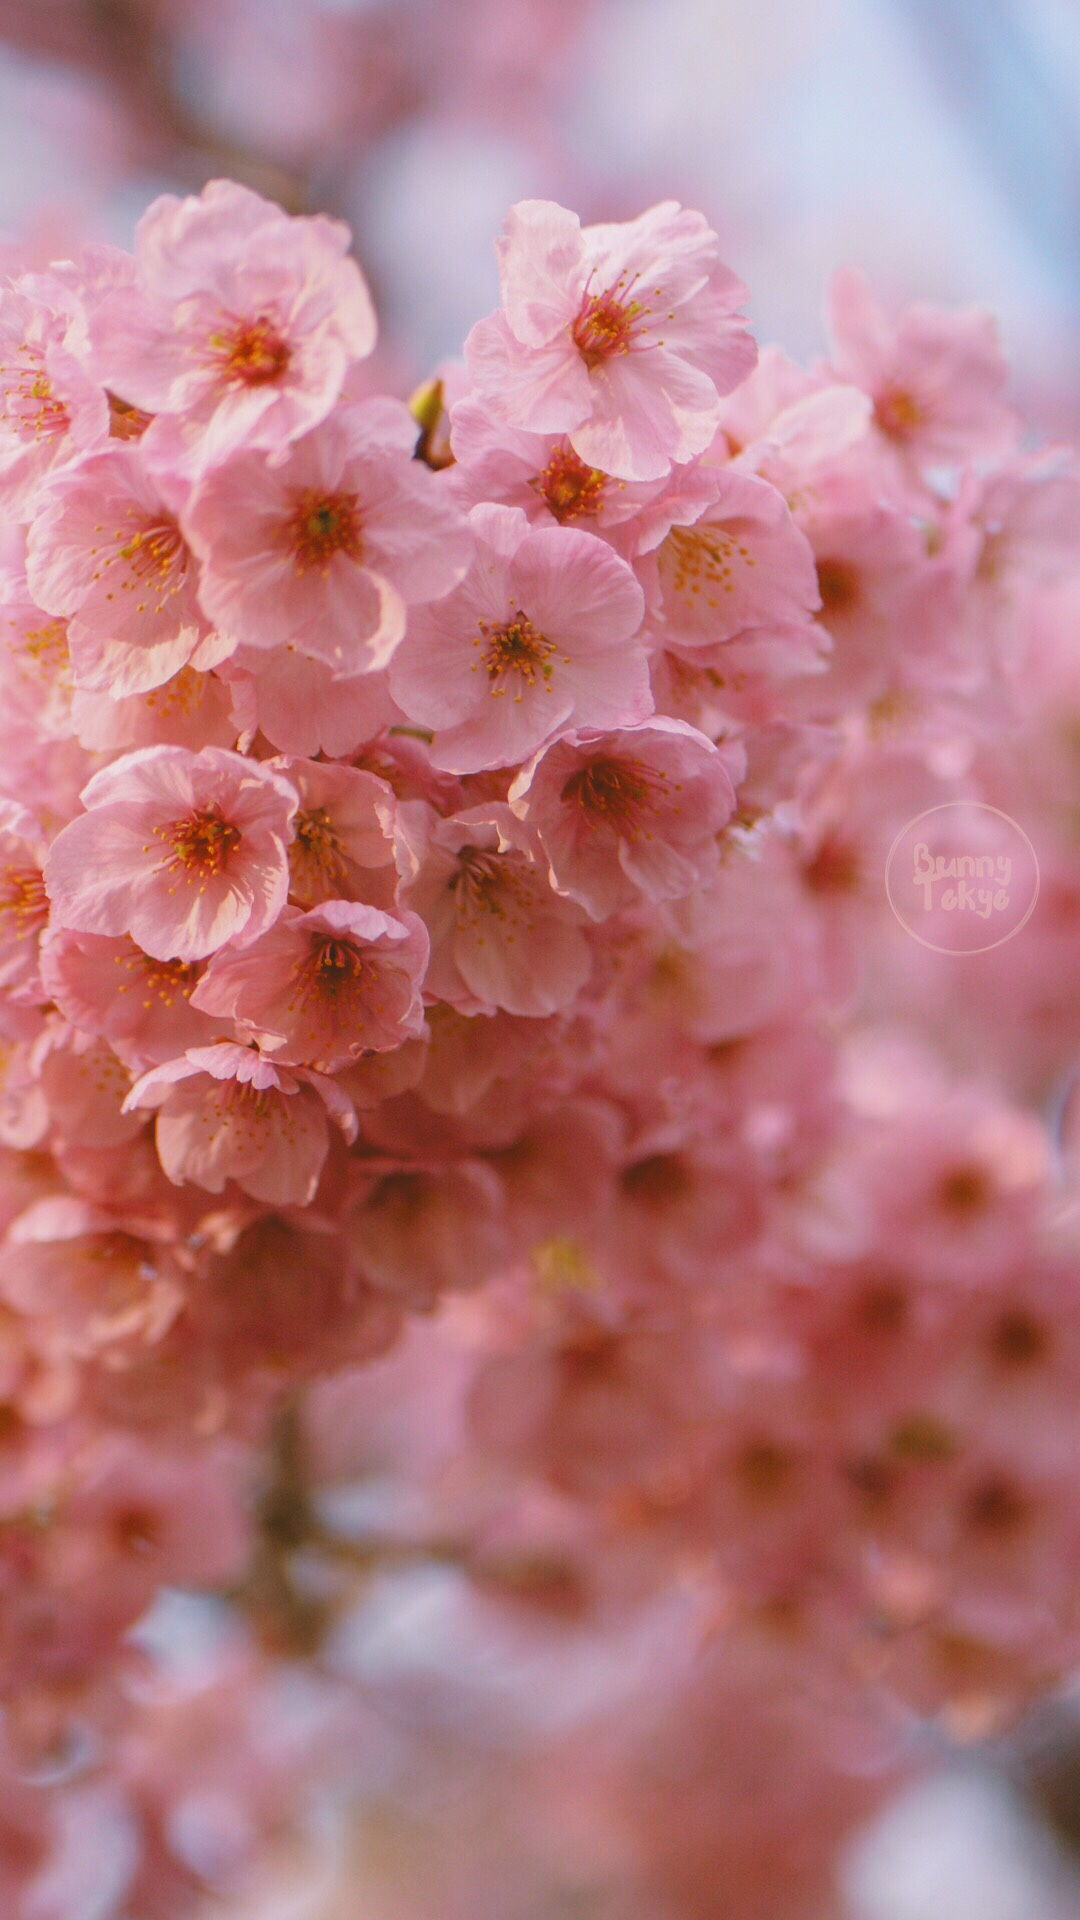 Eight Free Sakura Wallpapers For Your Phone Bunnytokyo